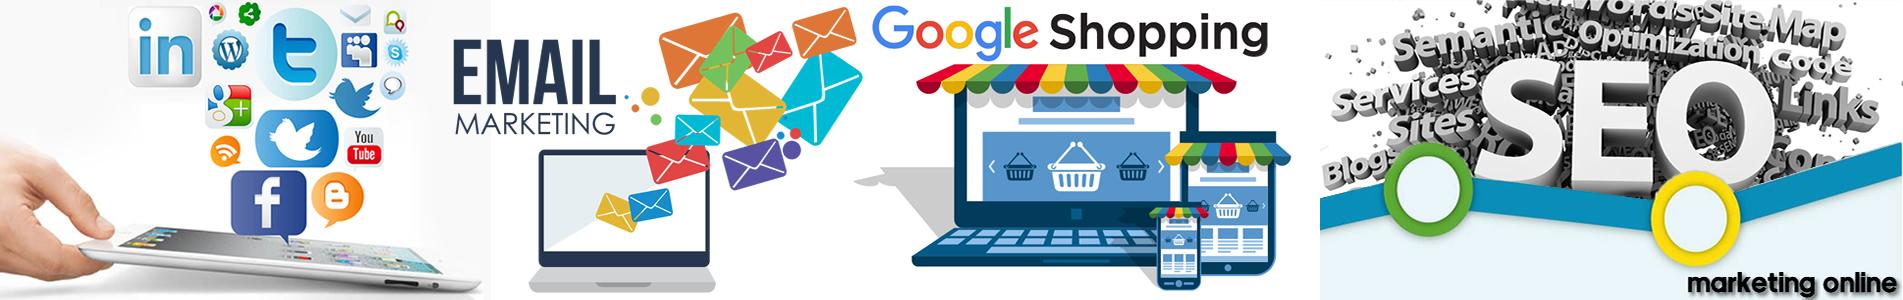 Servicios de marketing online. SEO, SEM, BLOG, REDES, MAILLINGS